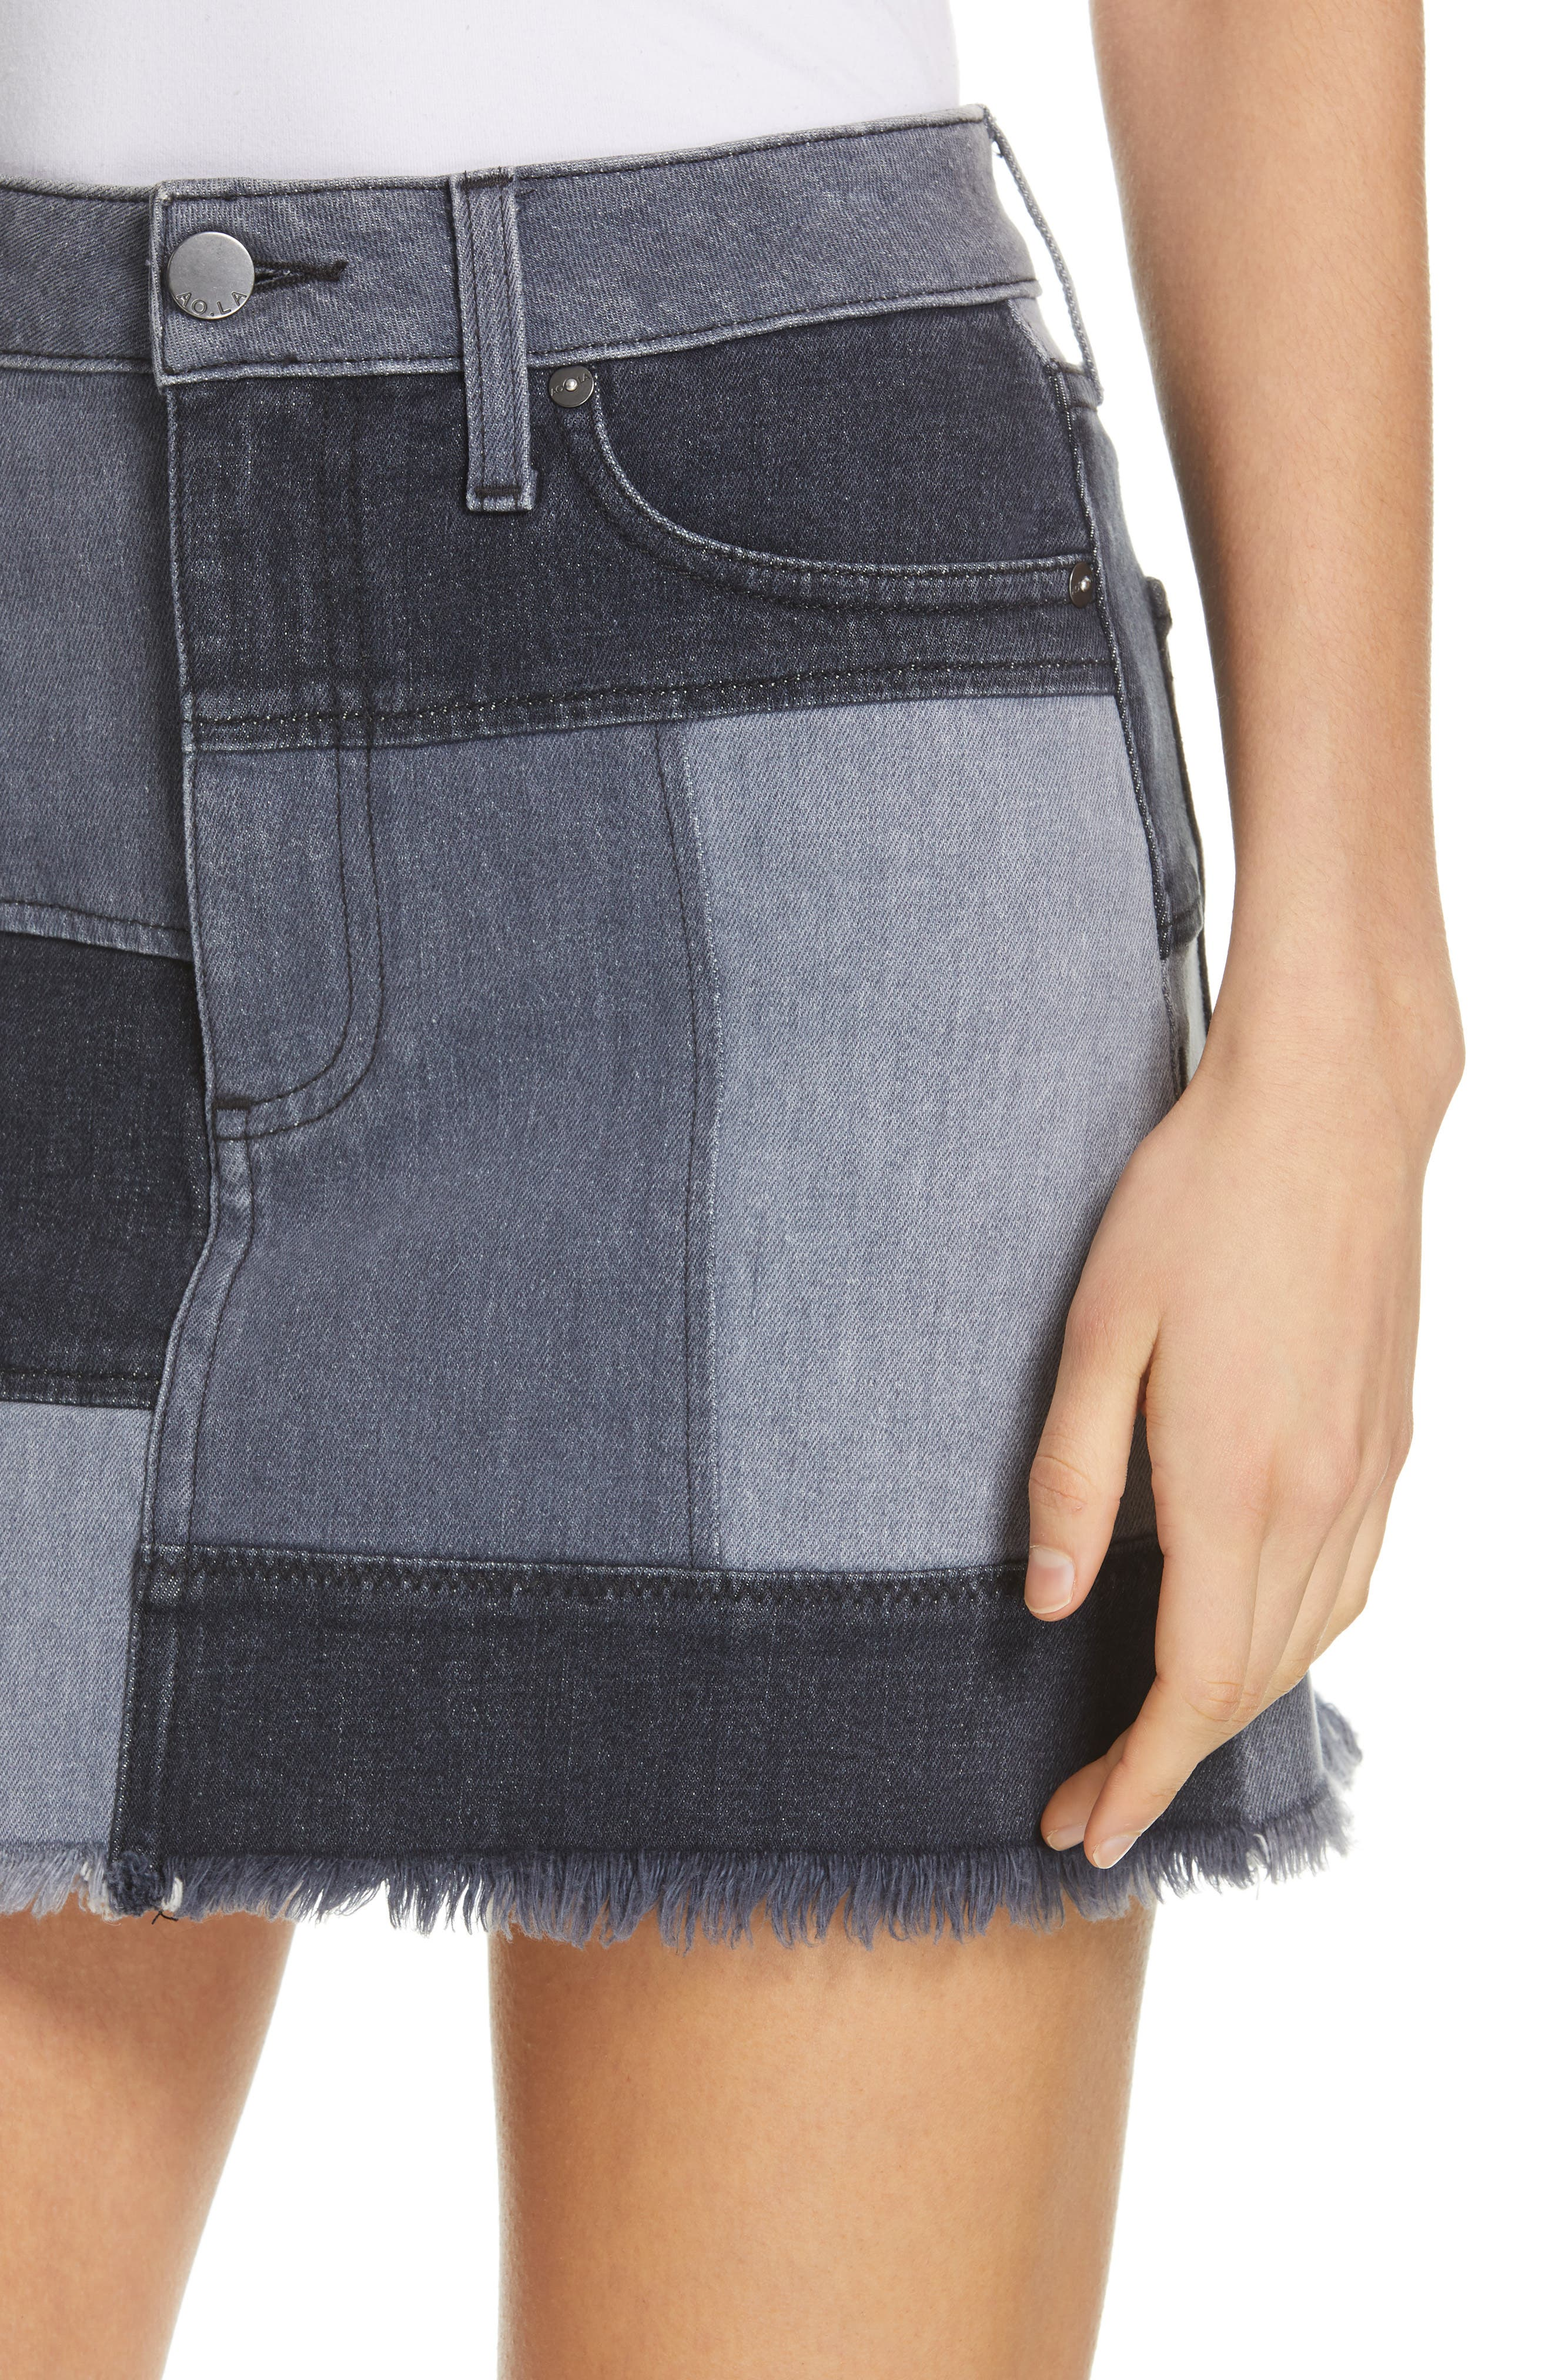 ALICE + OLIVIA JEANS,                             Amazing Patchwork Denim Miniskirt,                             Alternate thumbnail 4, color,                             NIGHT SKY